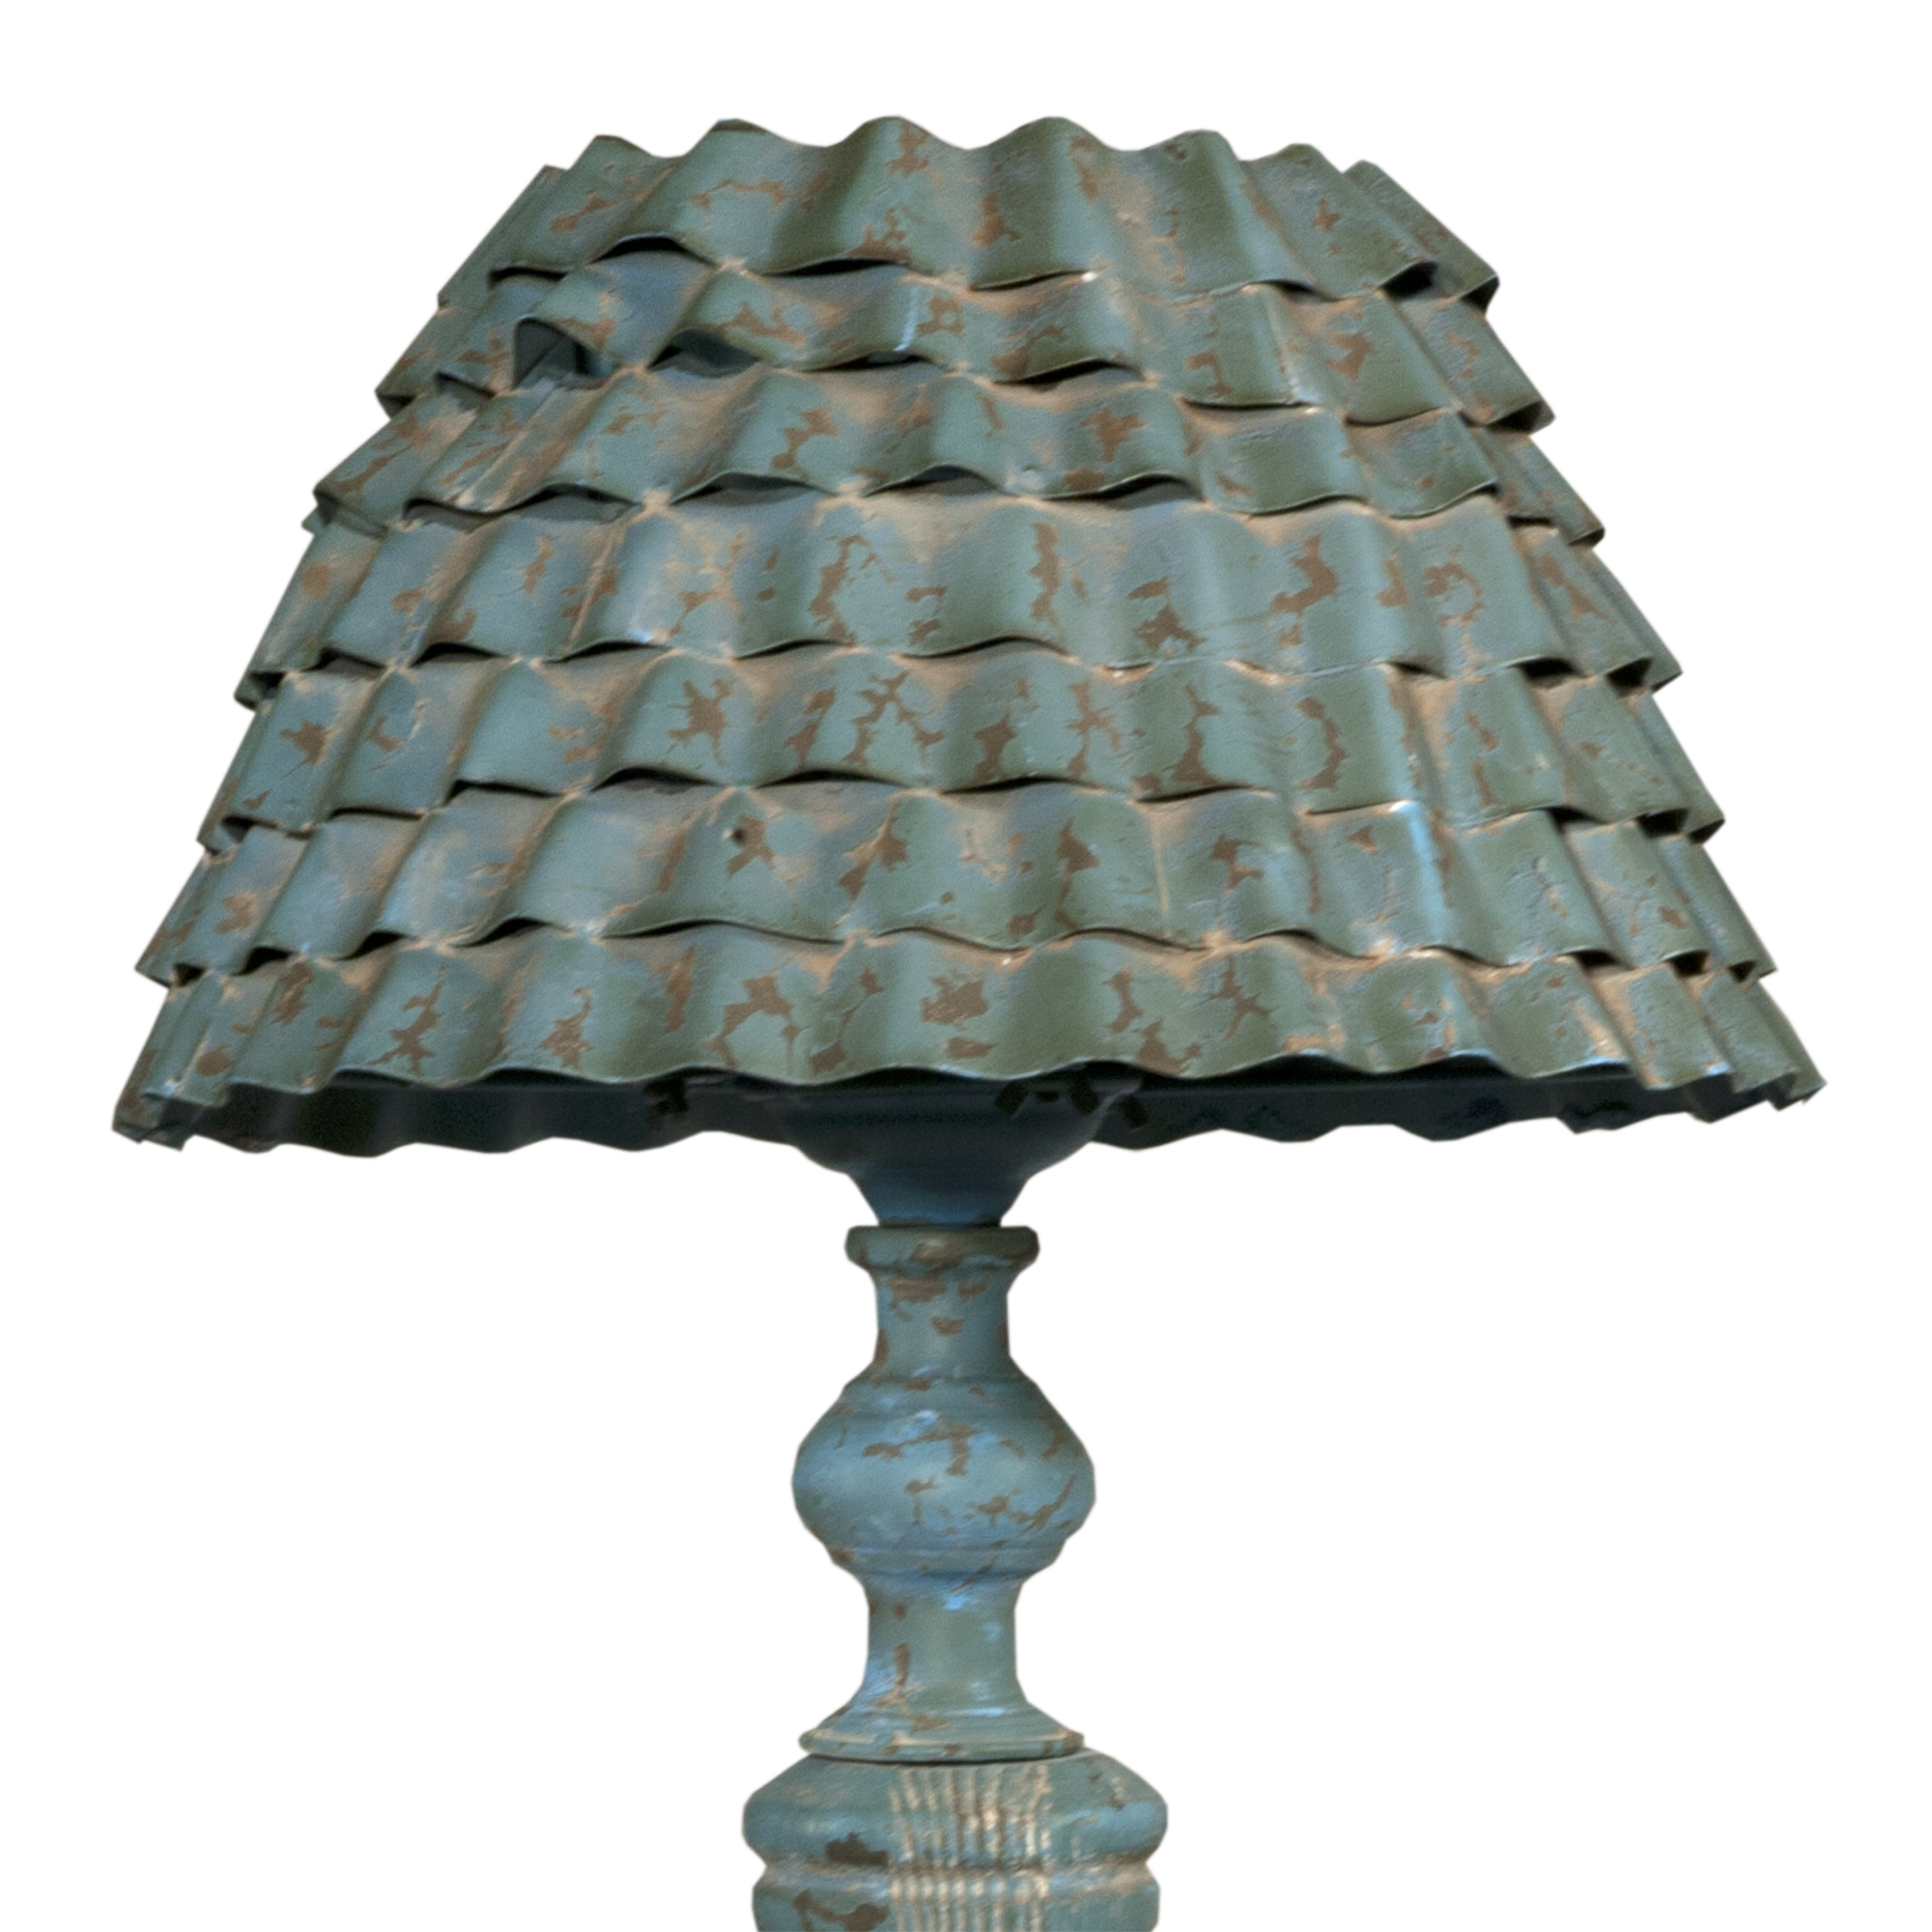 Shabby Chic Vintage Lamp - Duck Egg